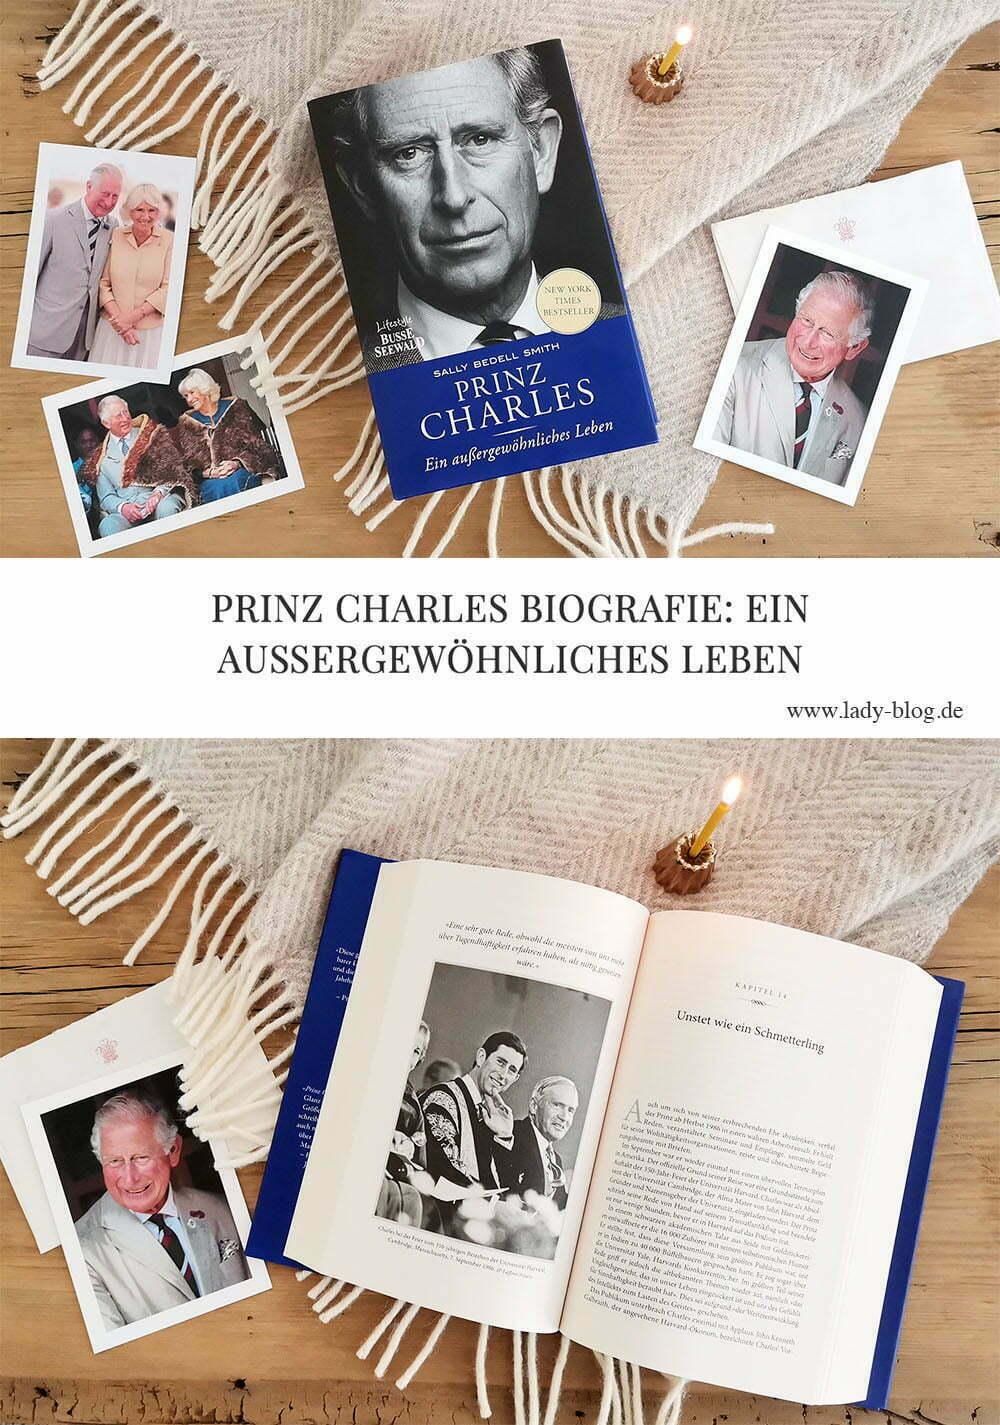 Prinz Charles Biografie